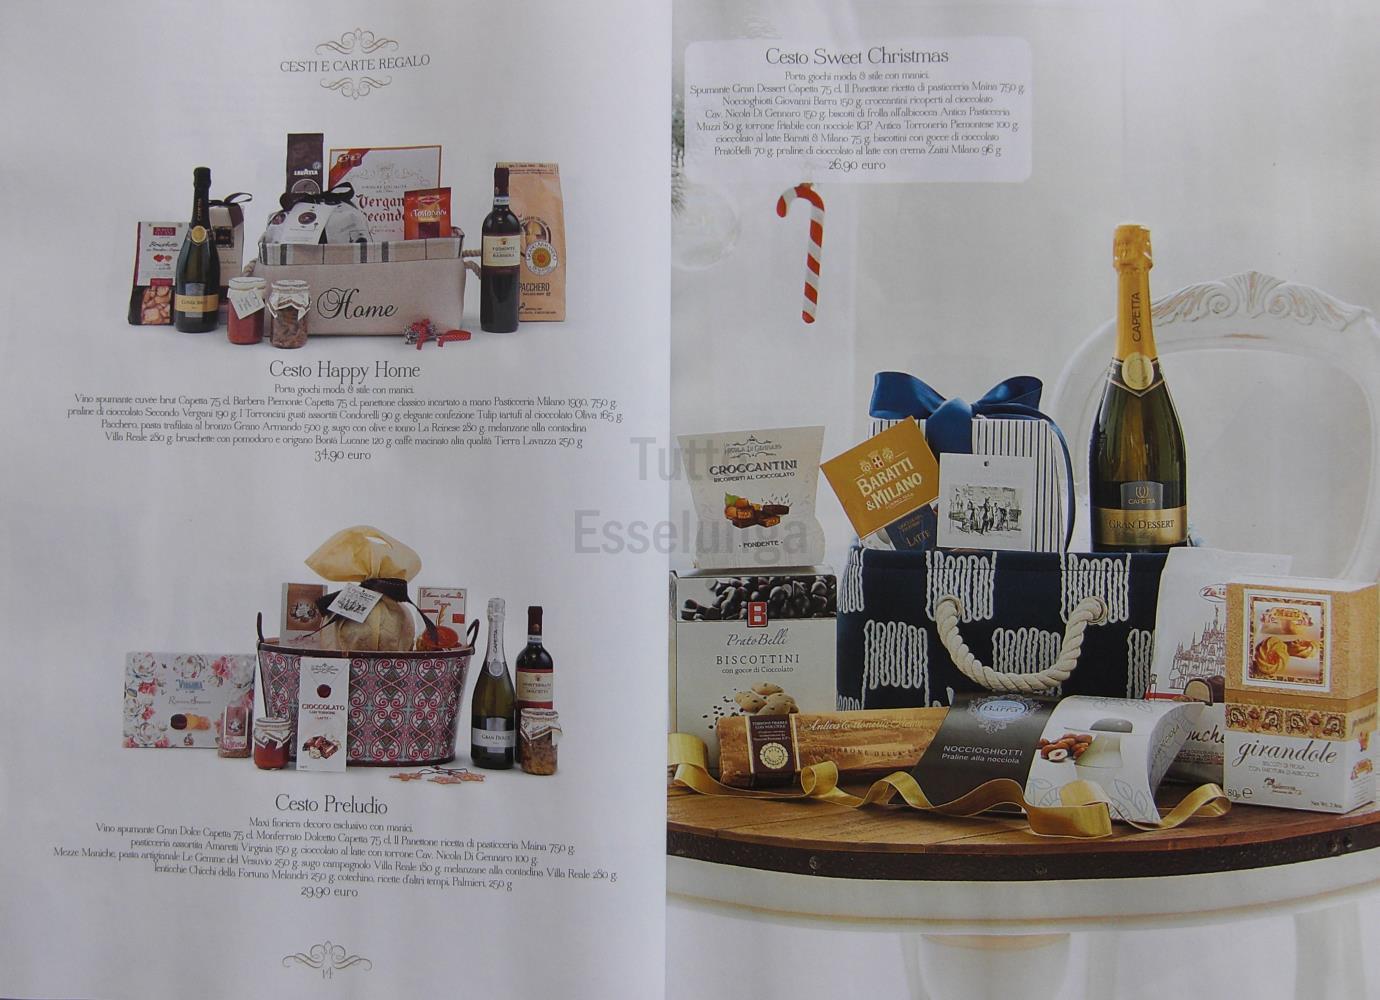 Idee regalo 2016 il catalogo esselunga di natale for Esselunga catalogo 2017